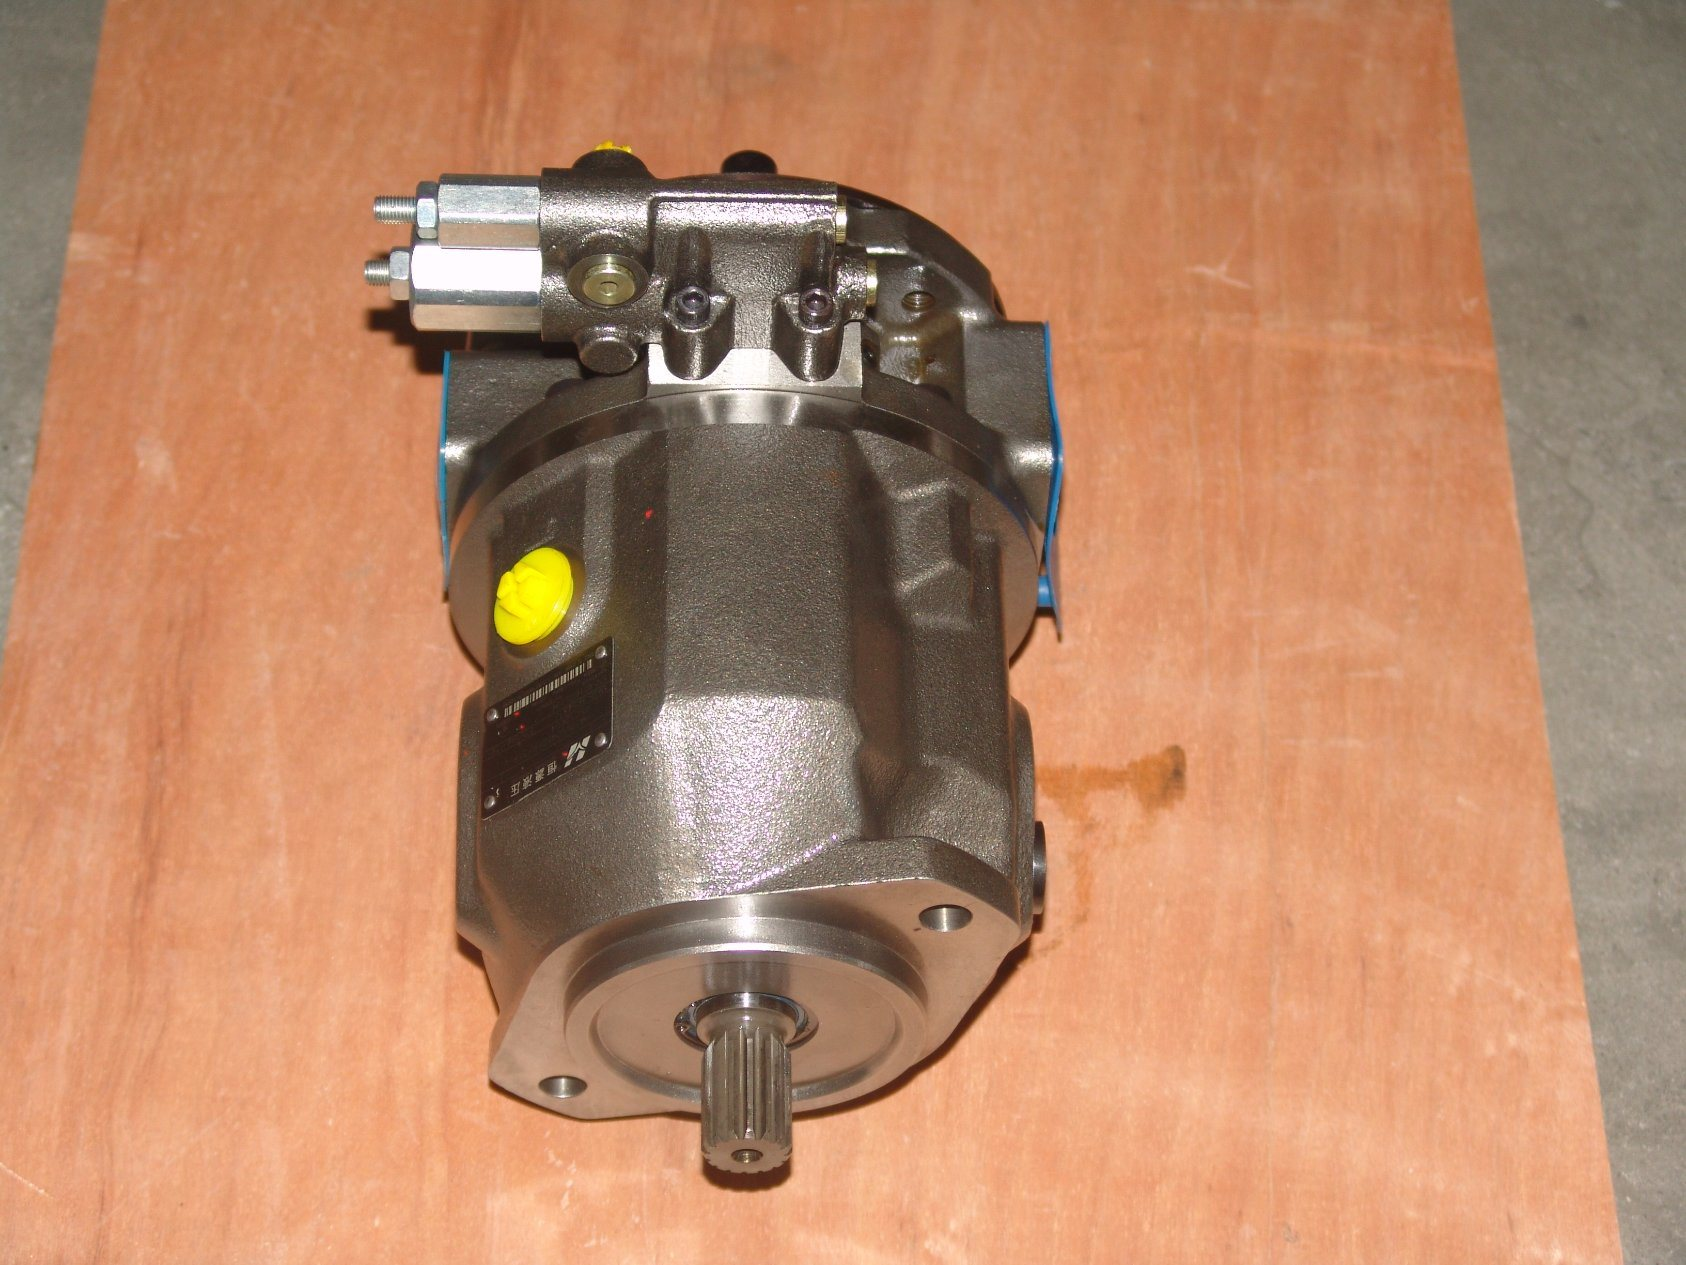 A10vso Series Hydraulic Piston Pump Ha10vso28dfr/31L-Puc12n00 for Industrial Application